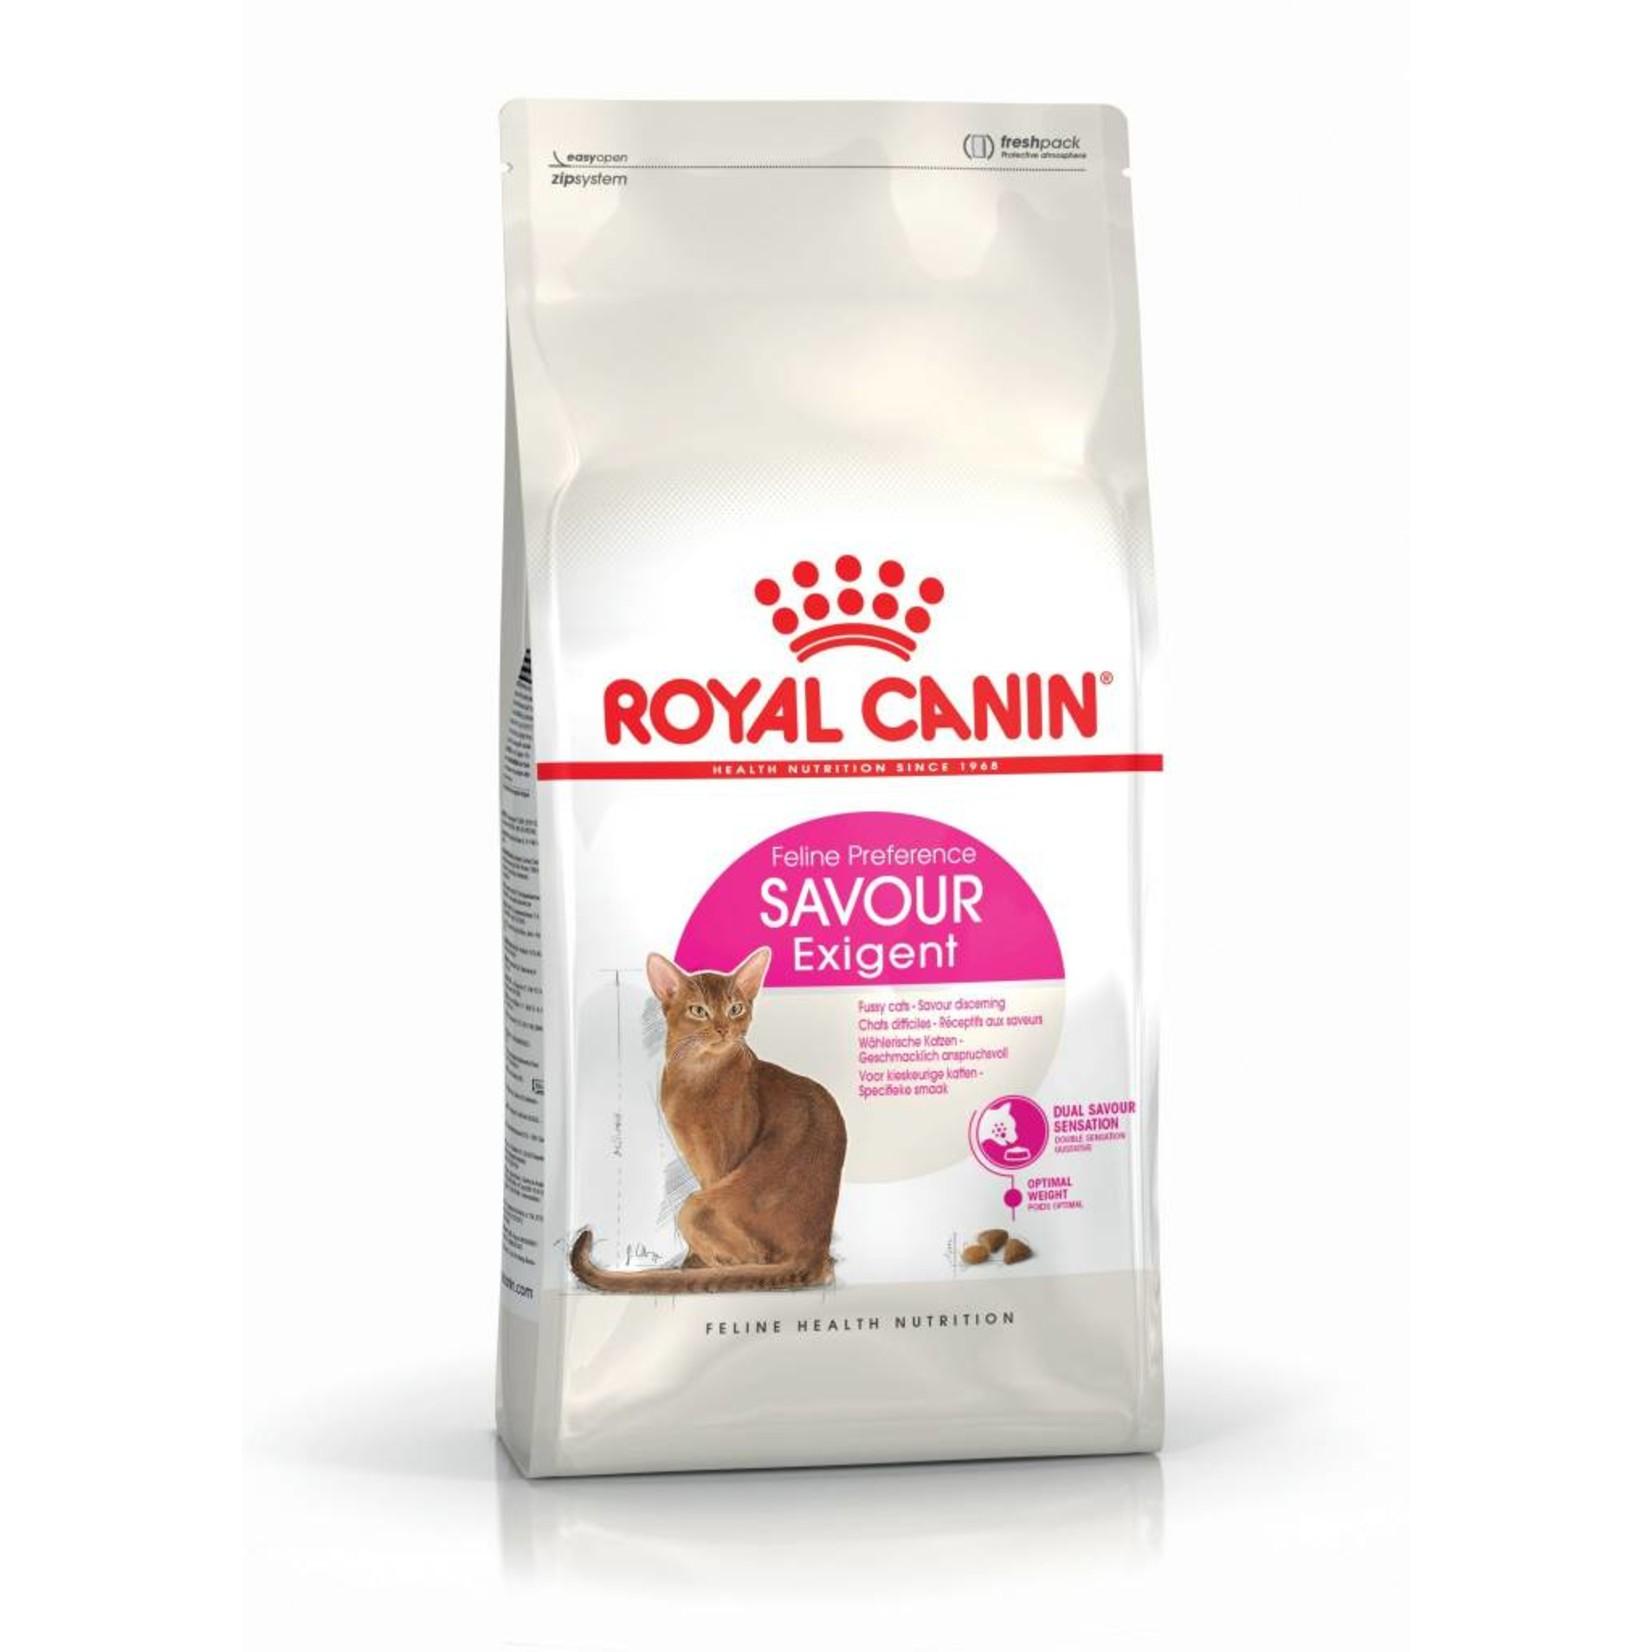 Royal Canin Exigent Savour Sensation Adult Cat Dry Food